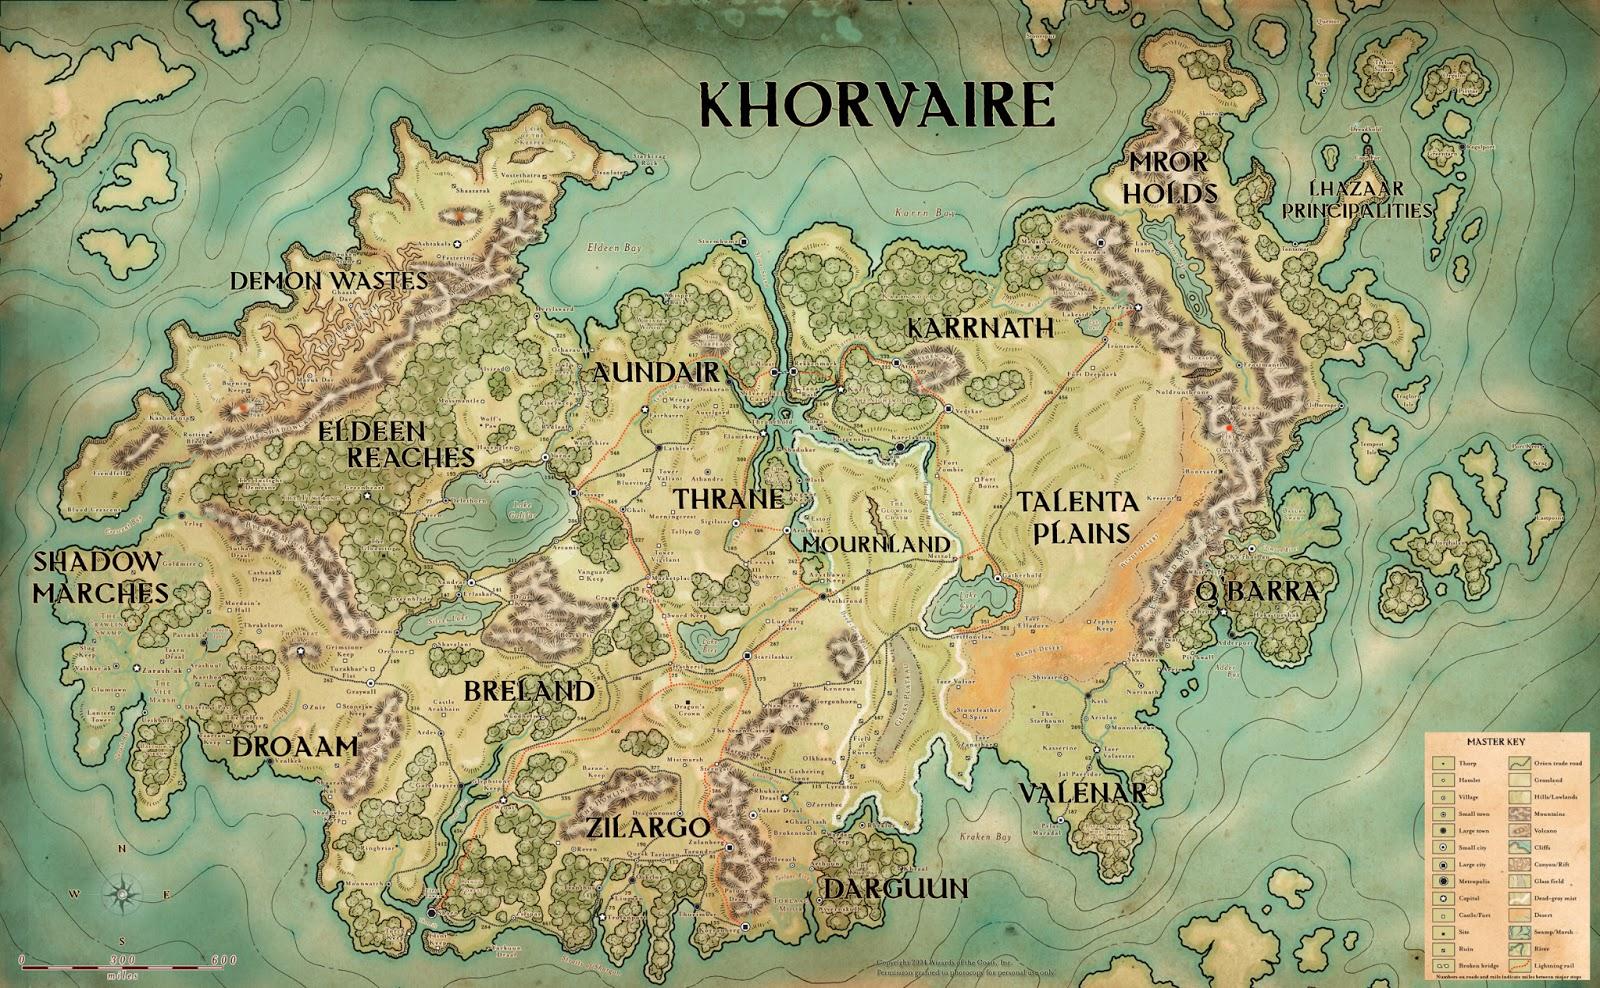 Ombre del Khorvaire